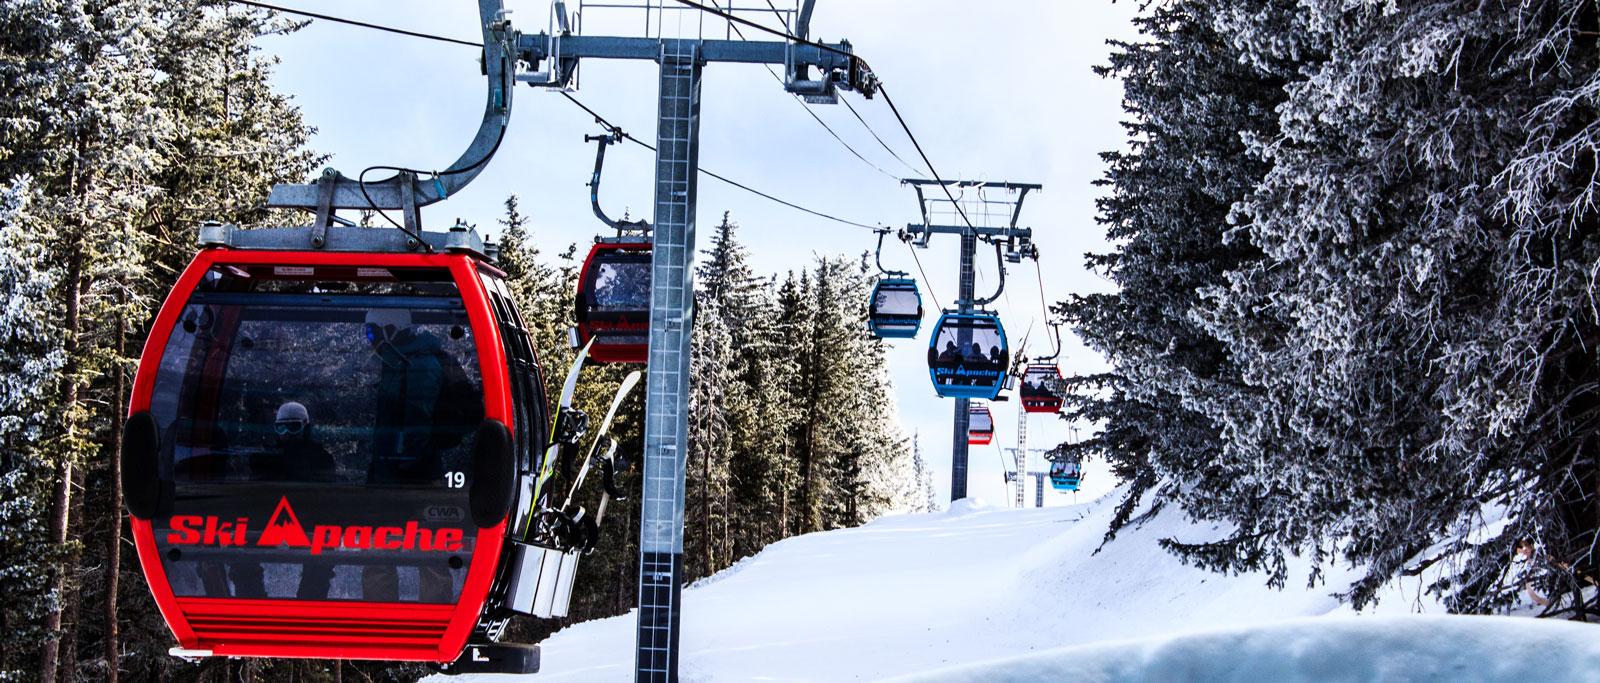 Ski_New_Mexico_skiapache-gondola.jpg